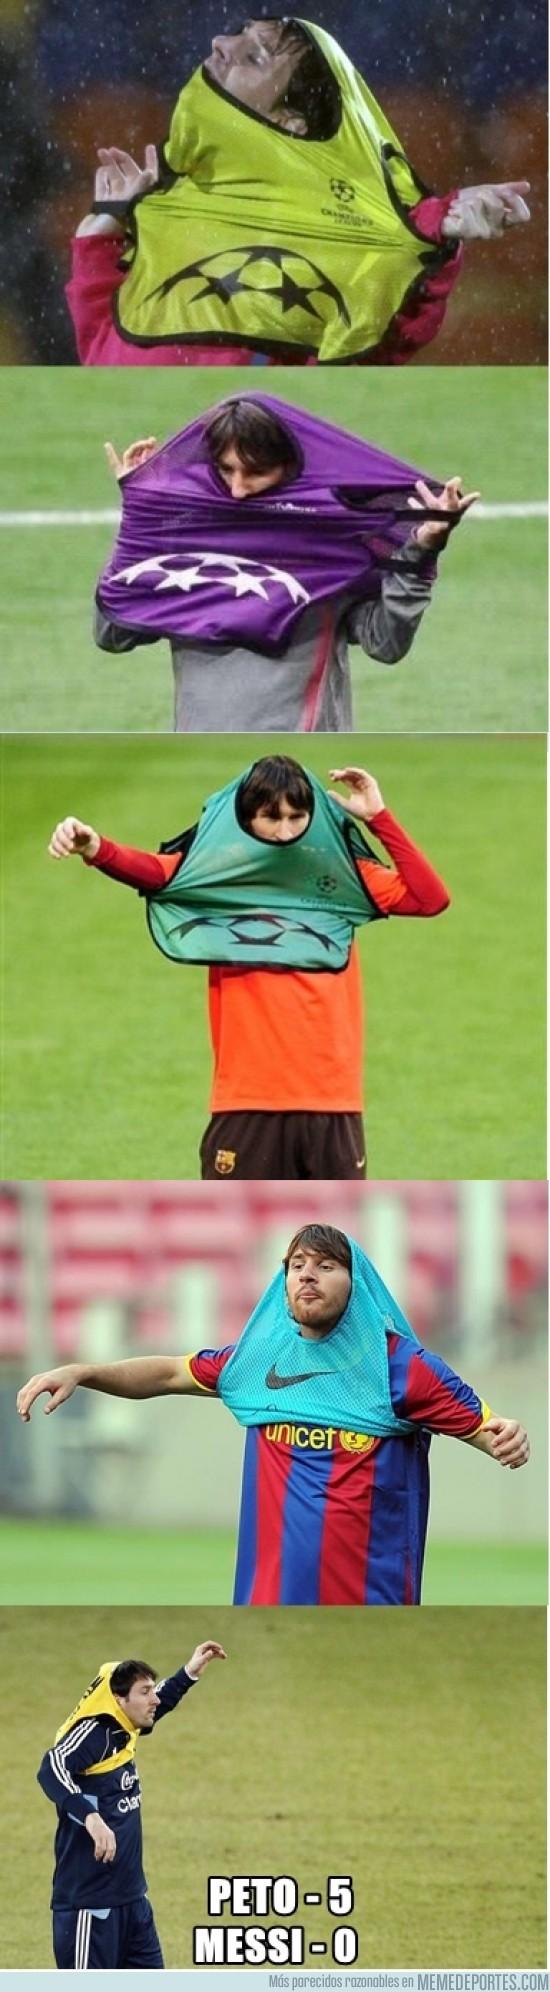 88391 - Messi sigue sin poder contra el peto